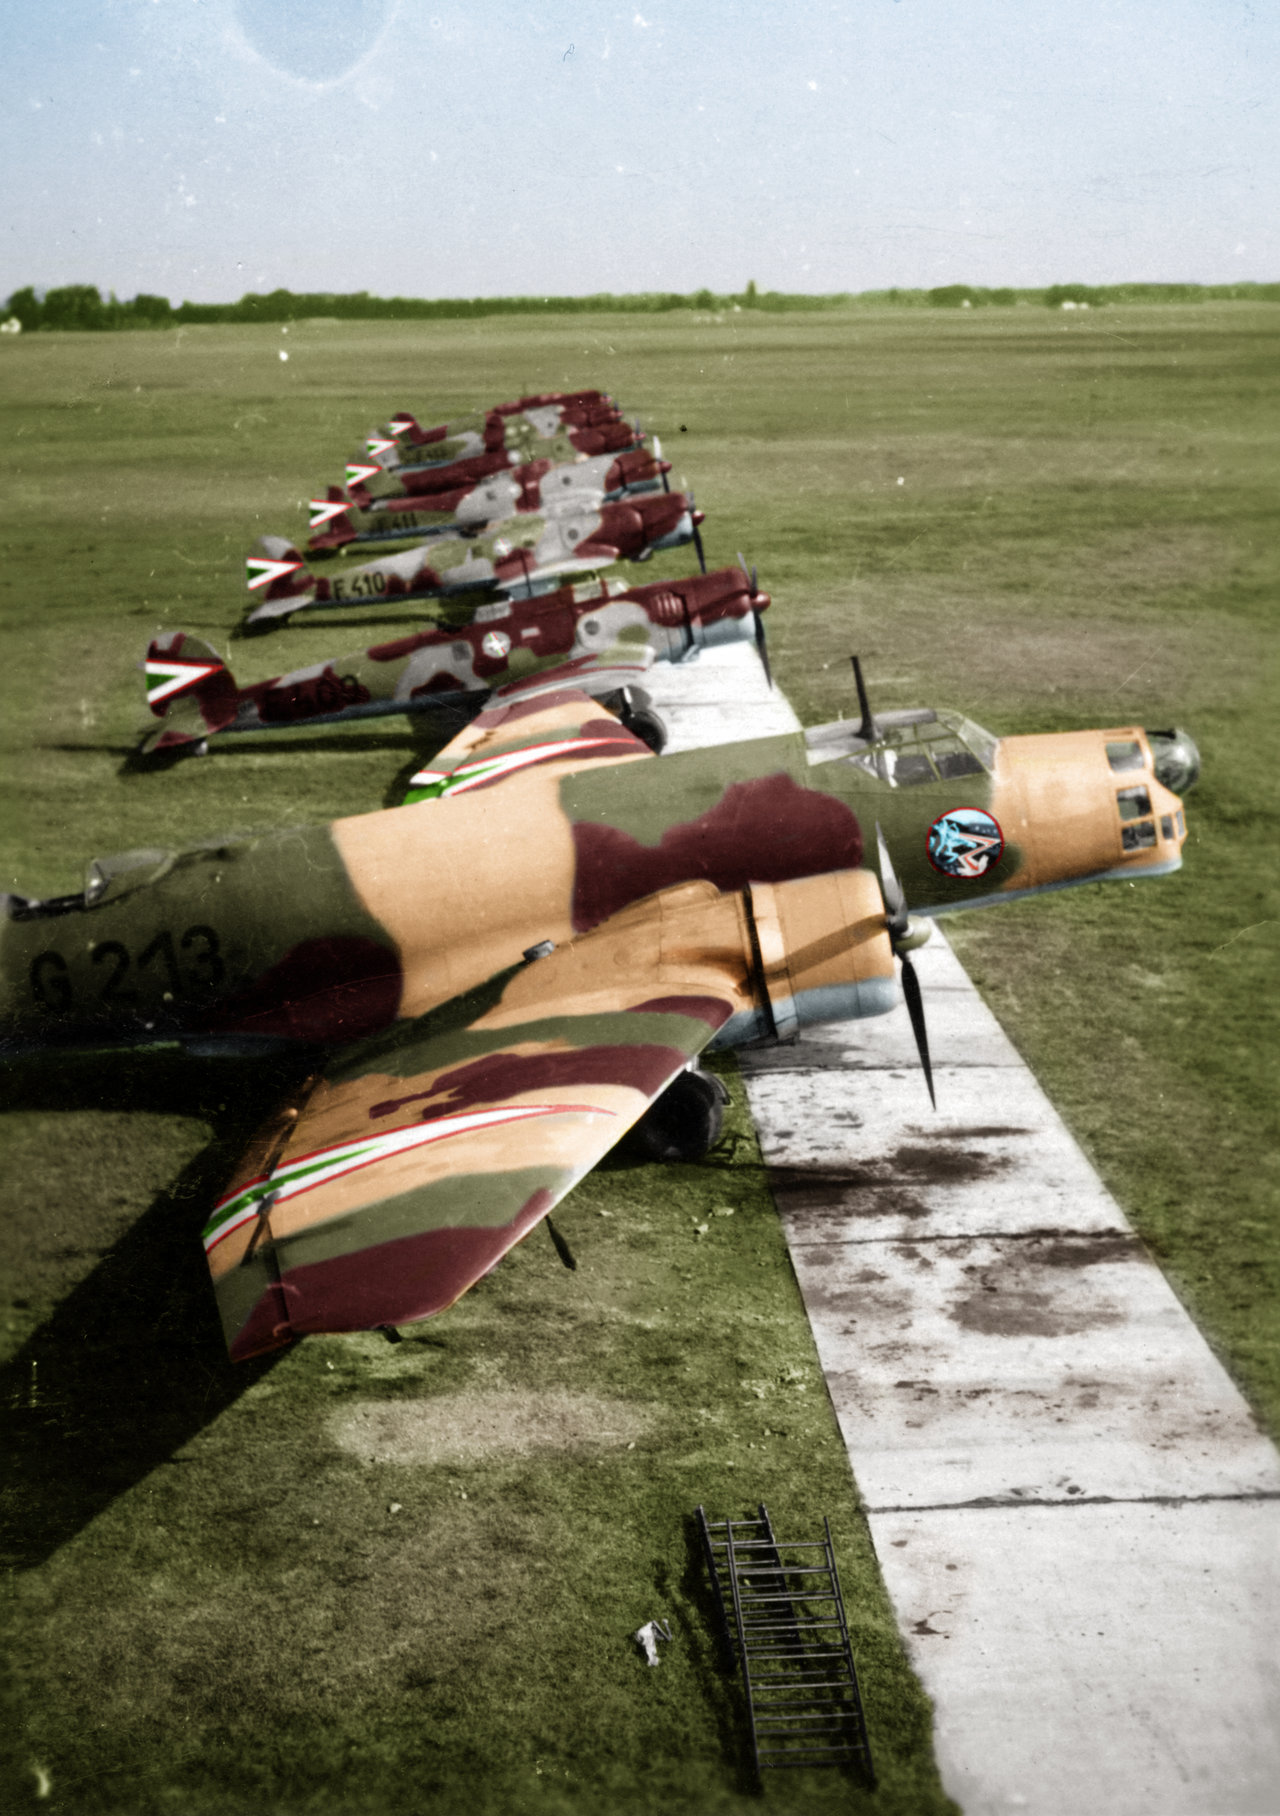 airfield_by_greenh0rn-d7jnhj4.jpg